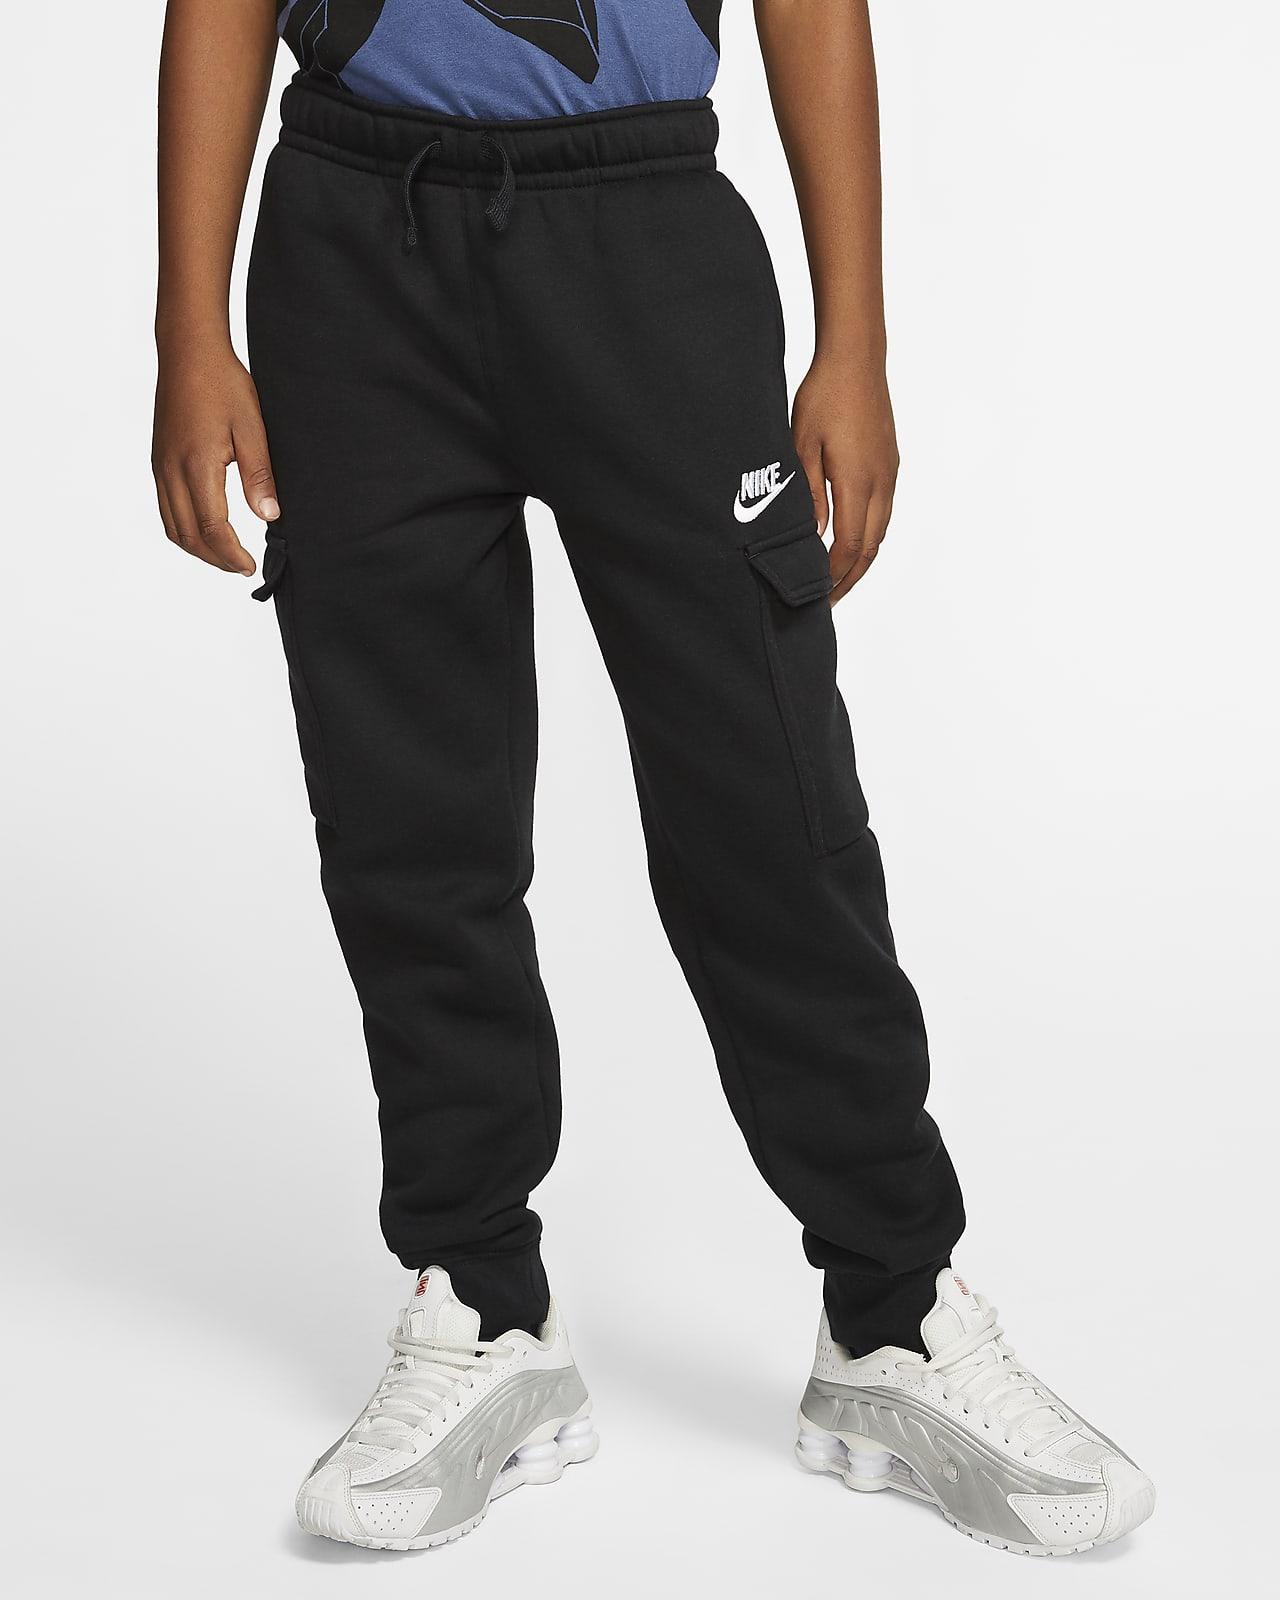 Nike Sportswear Club Cargohose für ältere Kinder (Jungen)